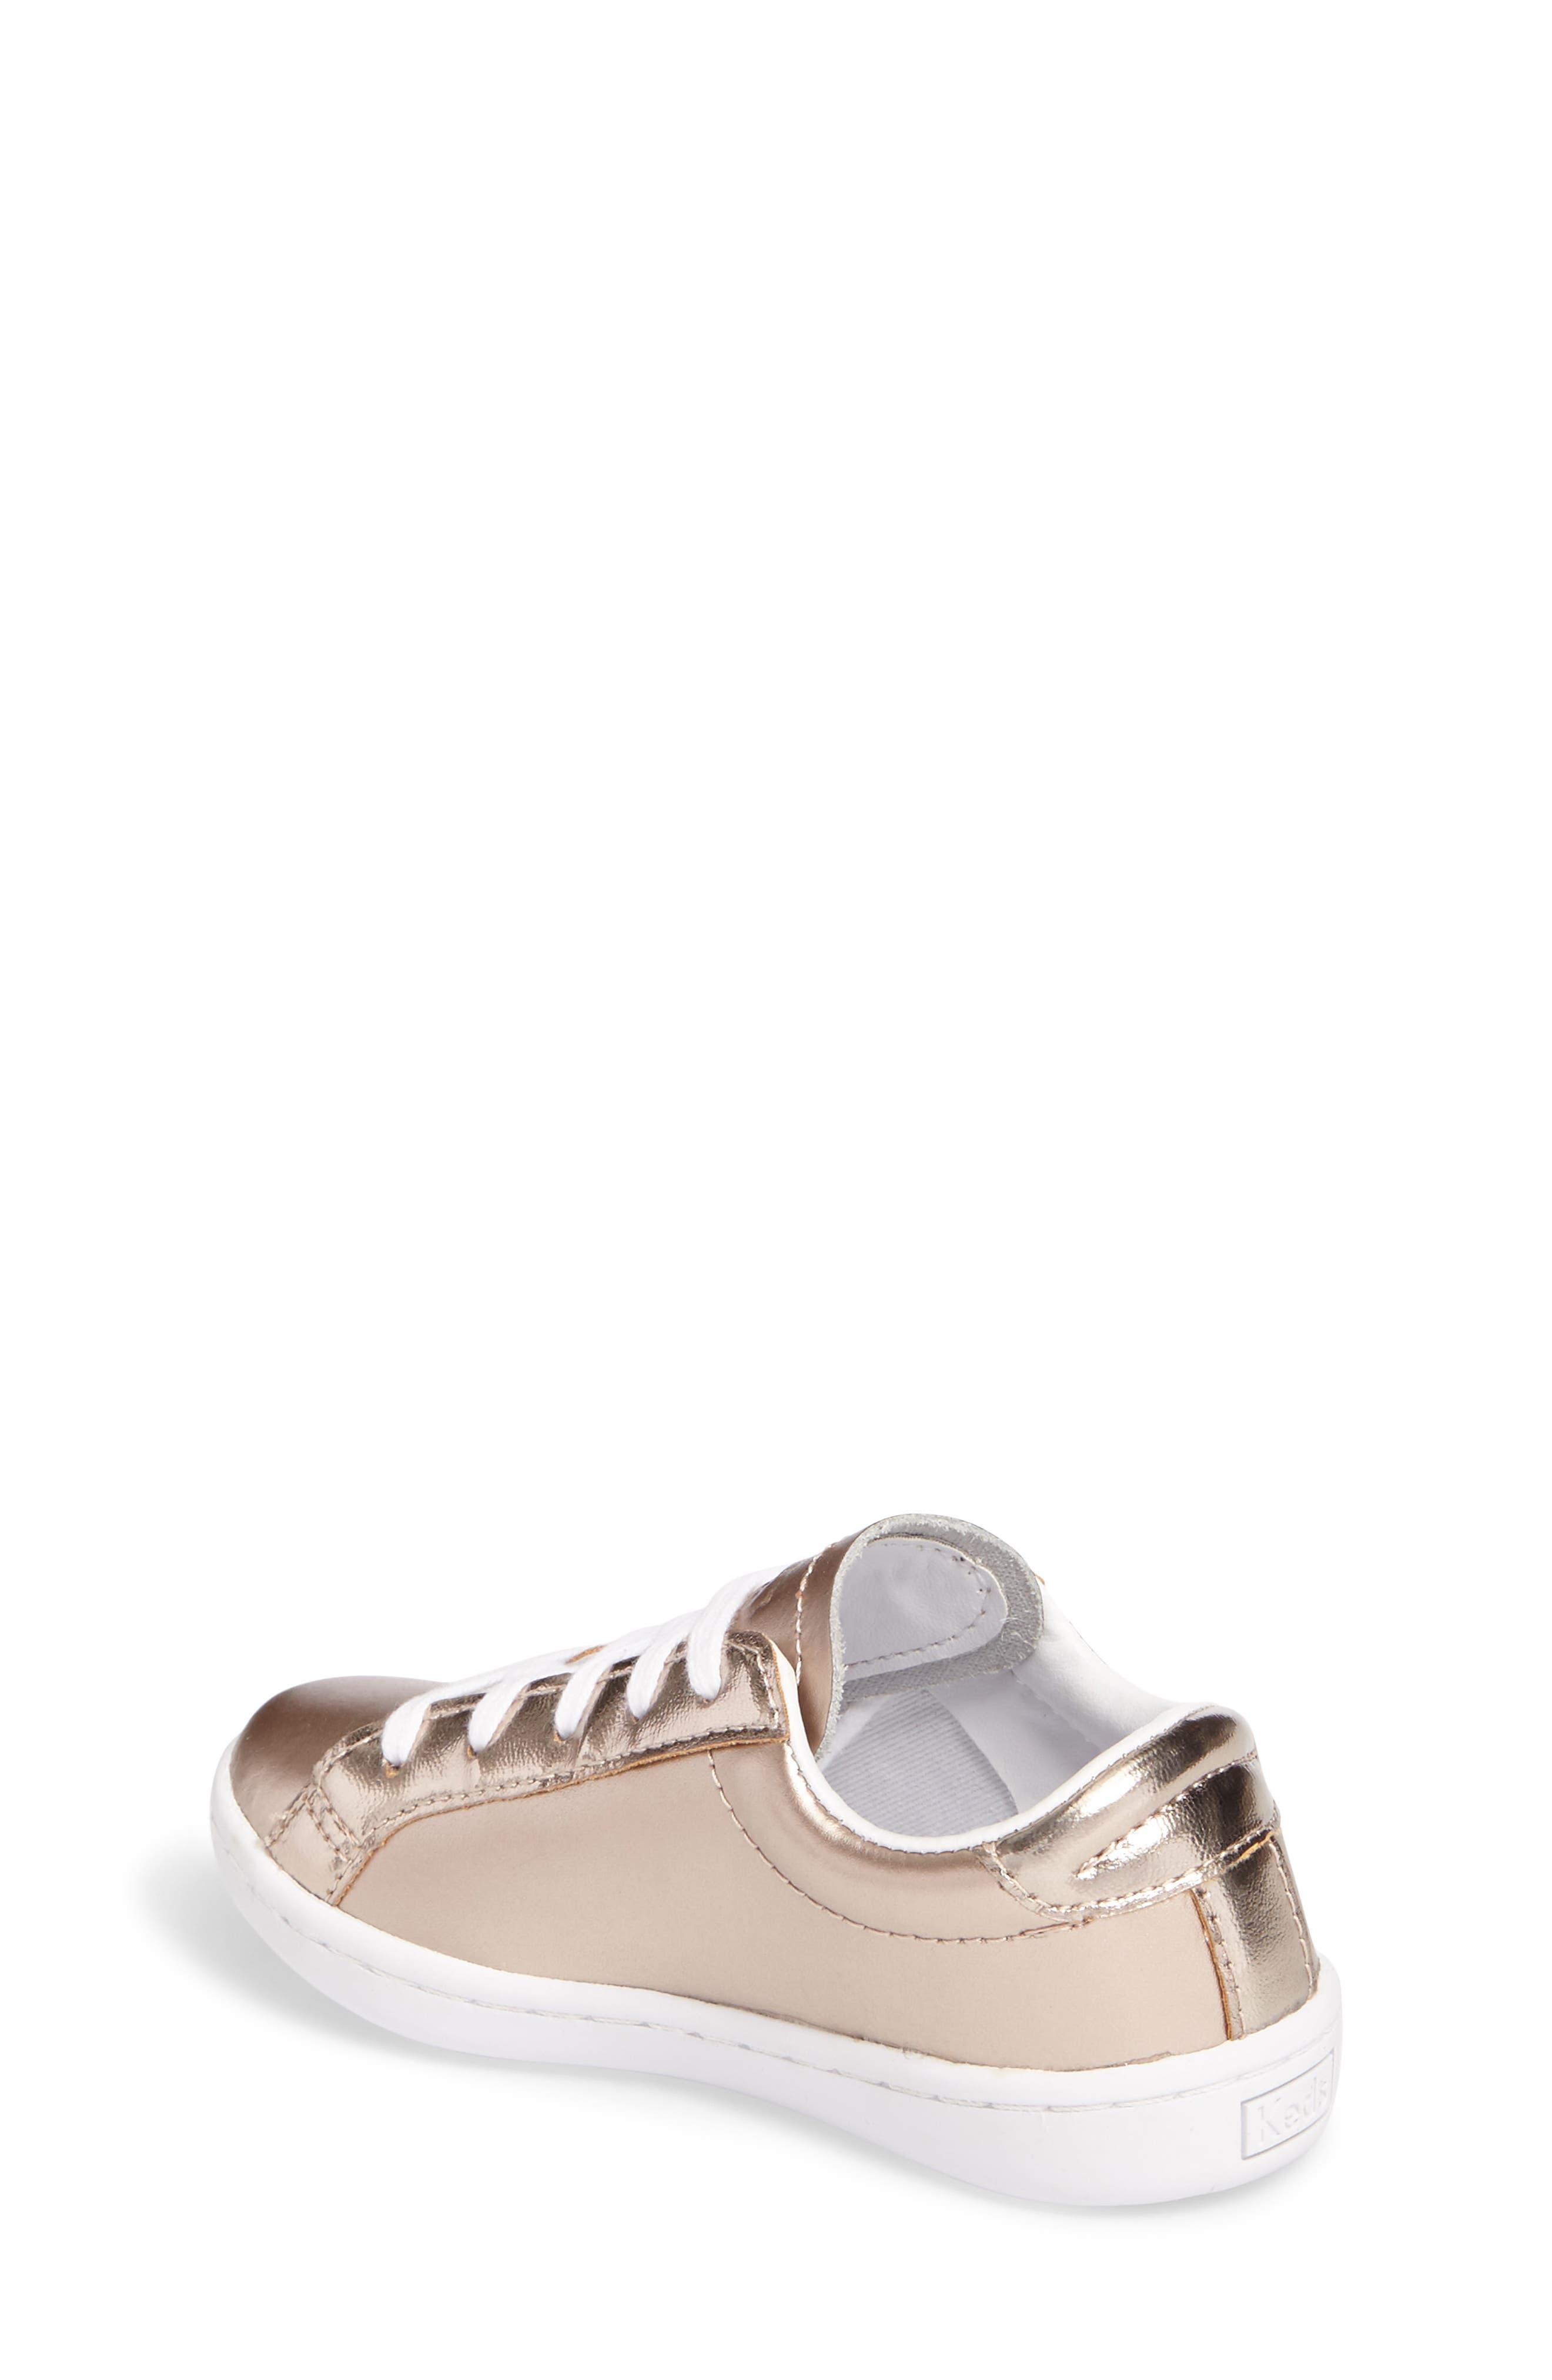 Ace Sneaker,                             Alternate thumbnail 2, color,                             220